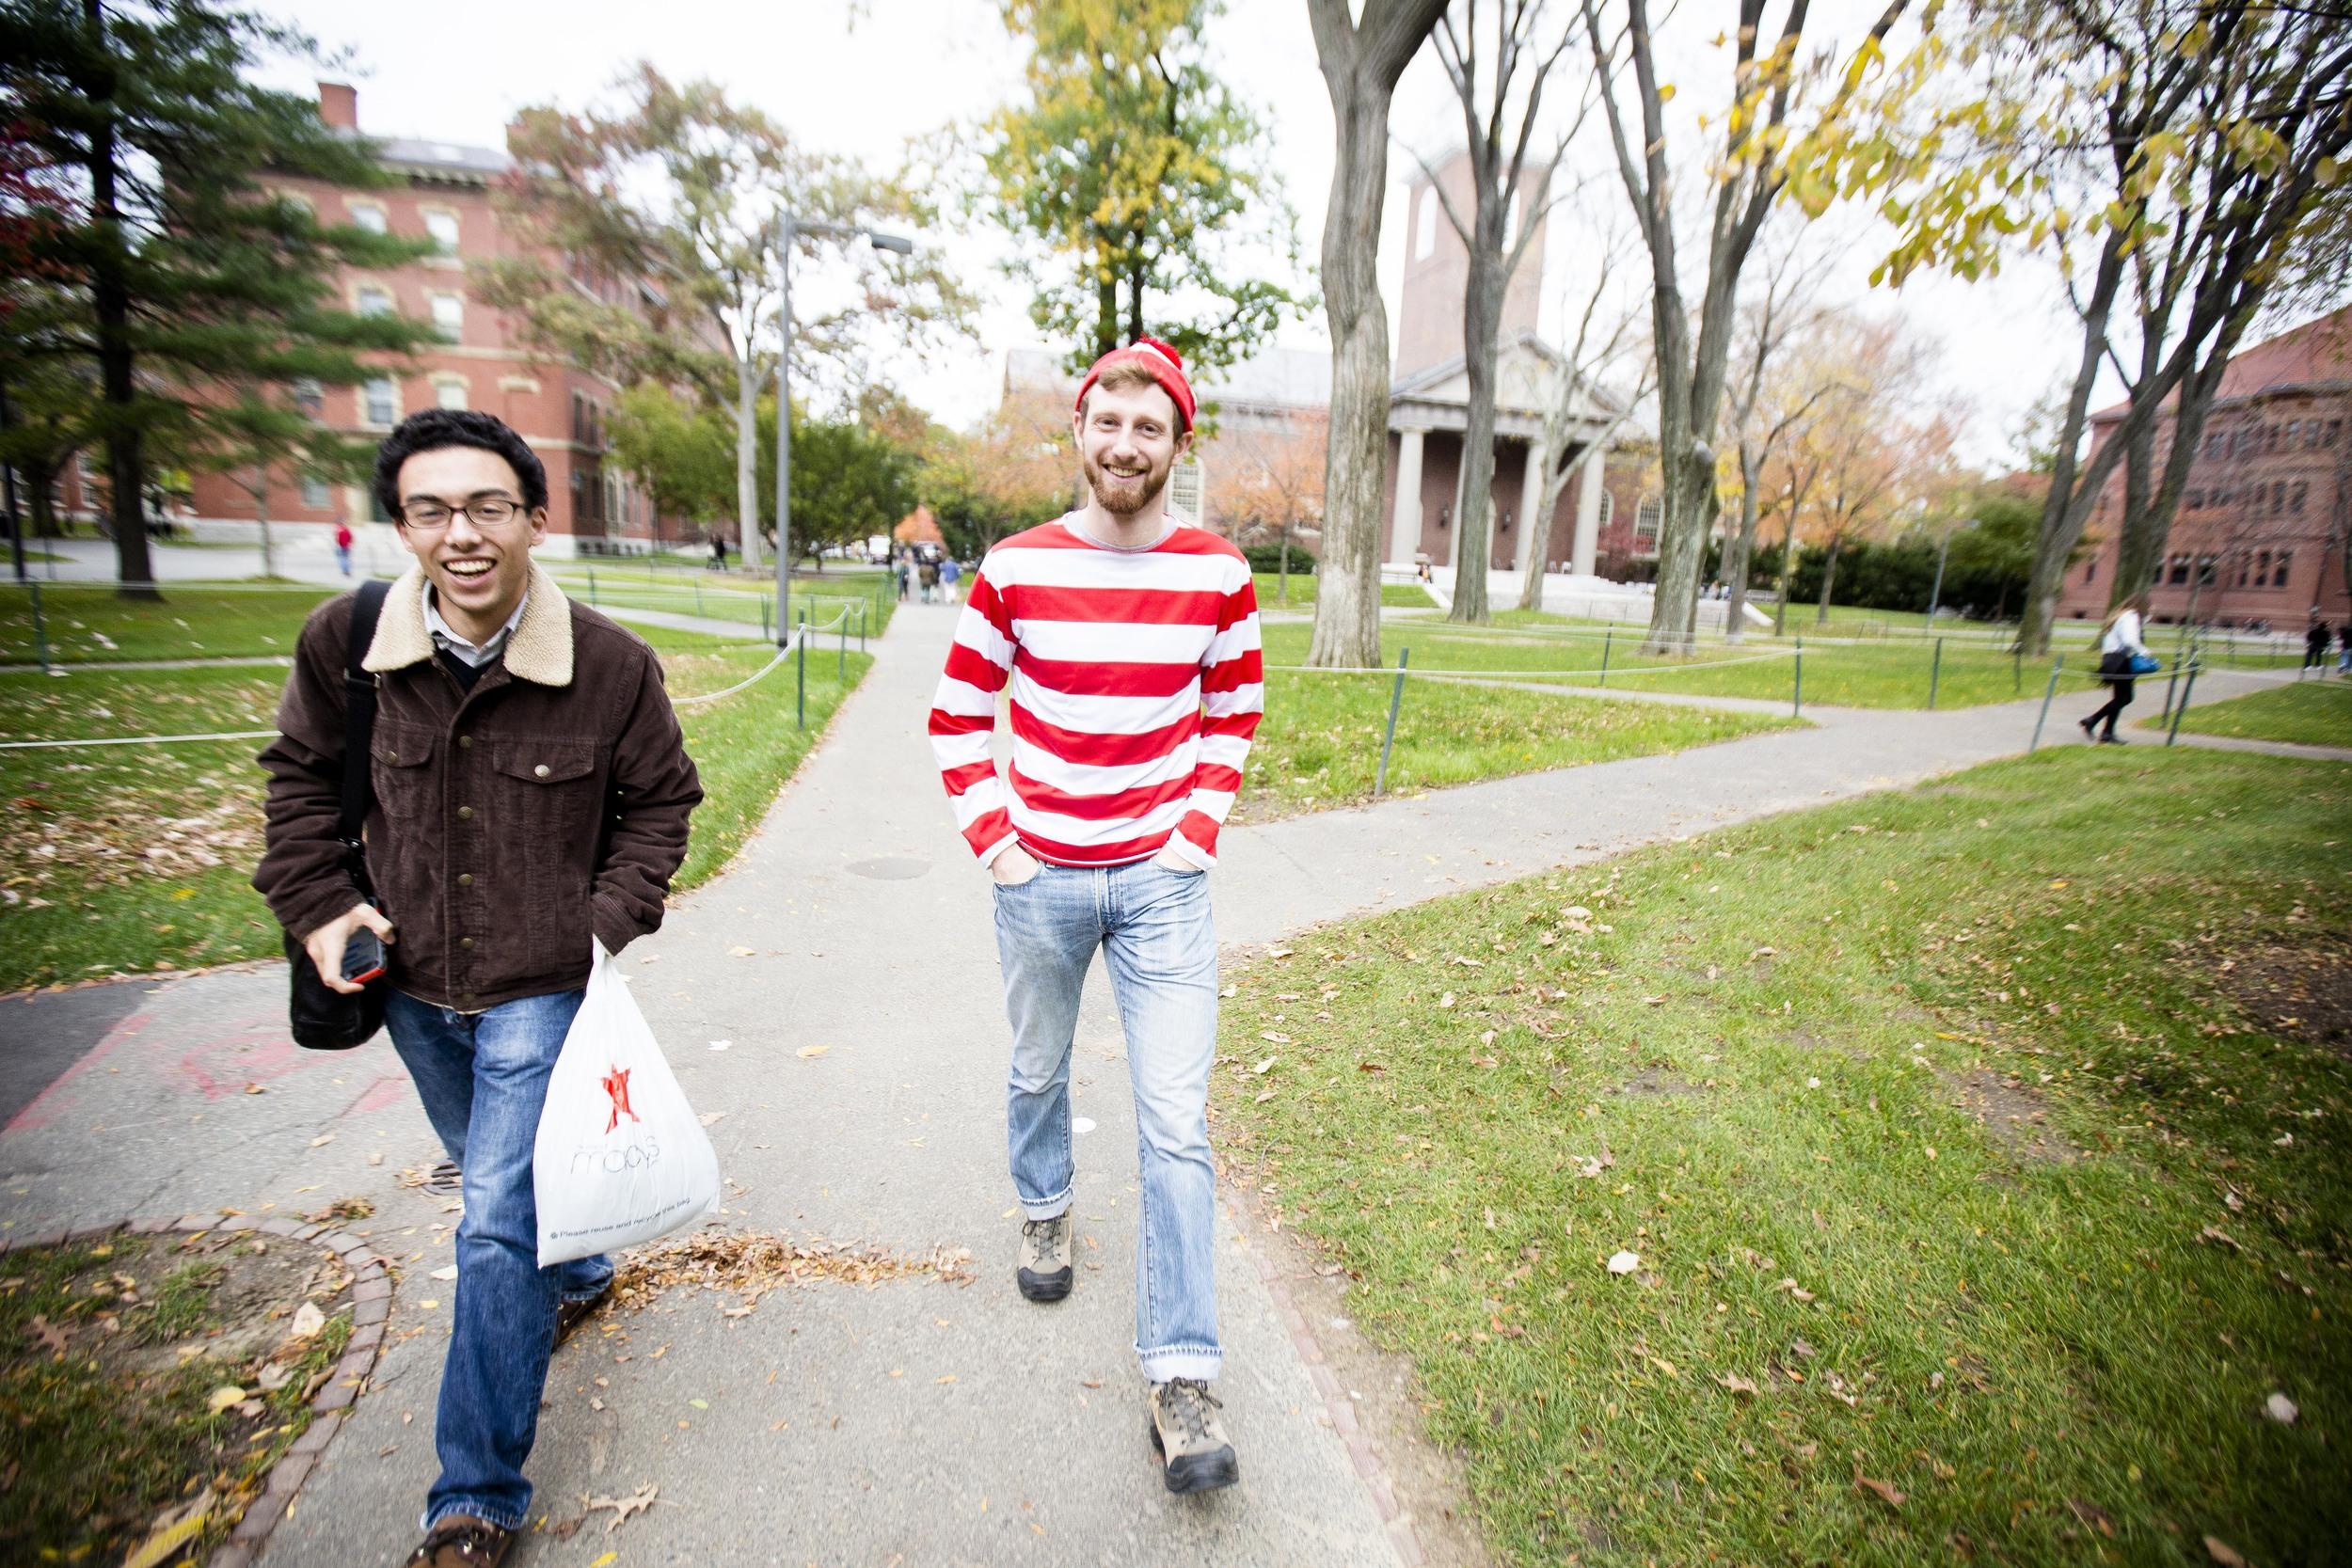 akob, Lindaas '13. Waldo. Photo By Ann wang